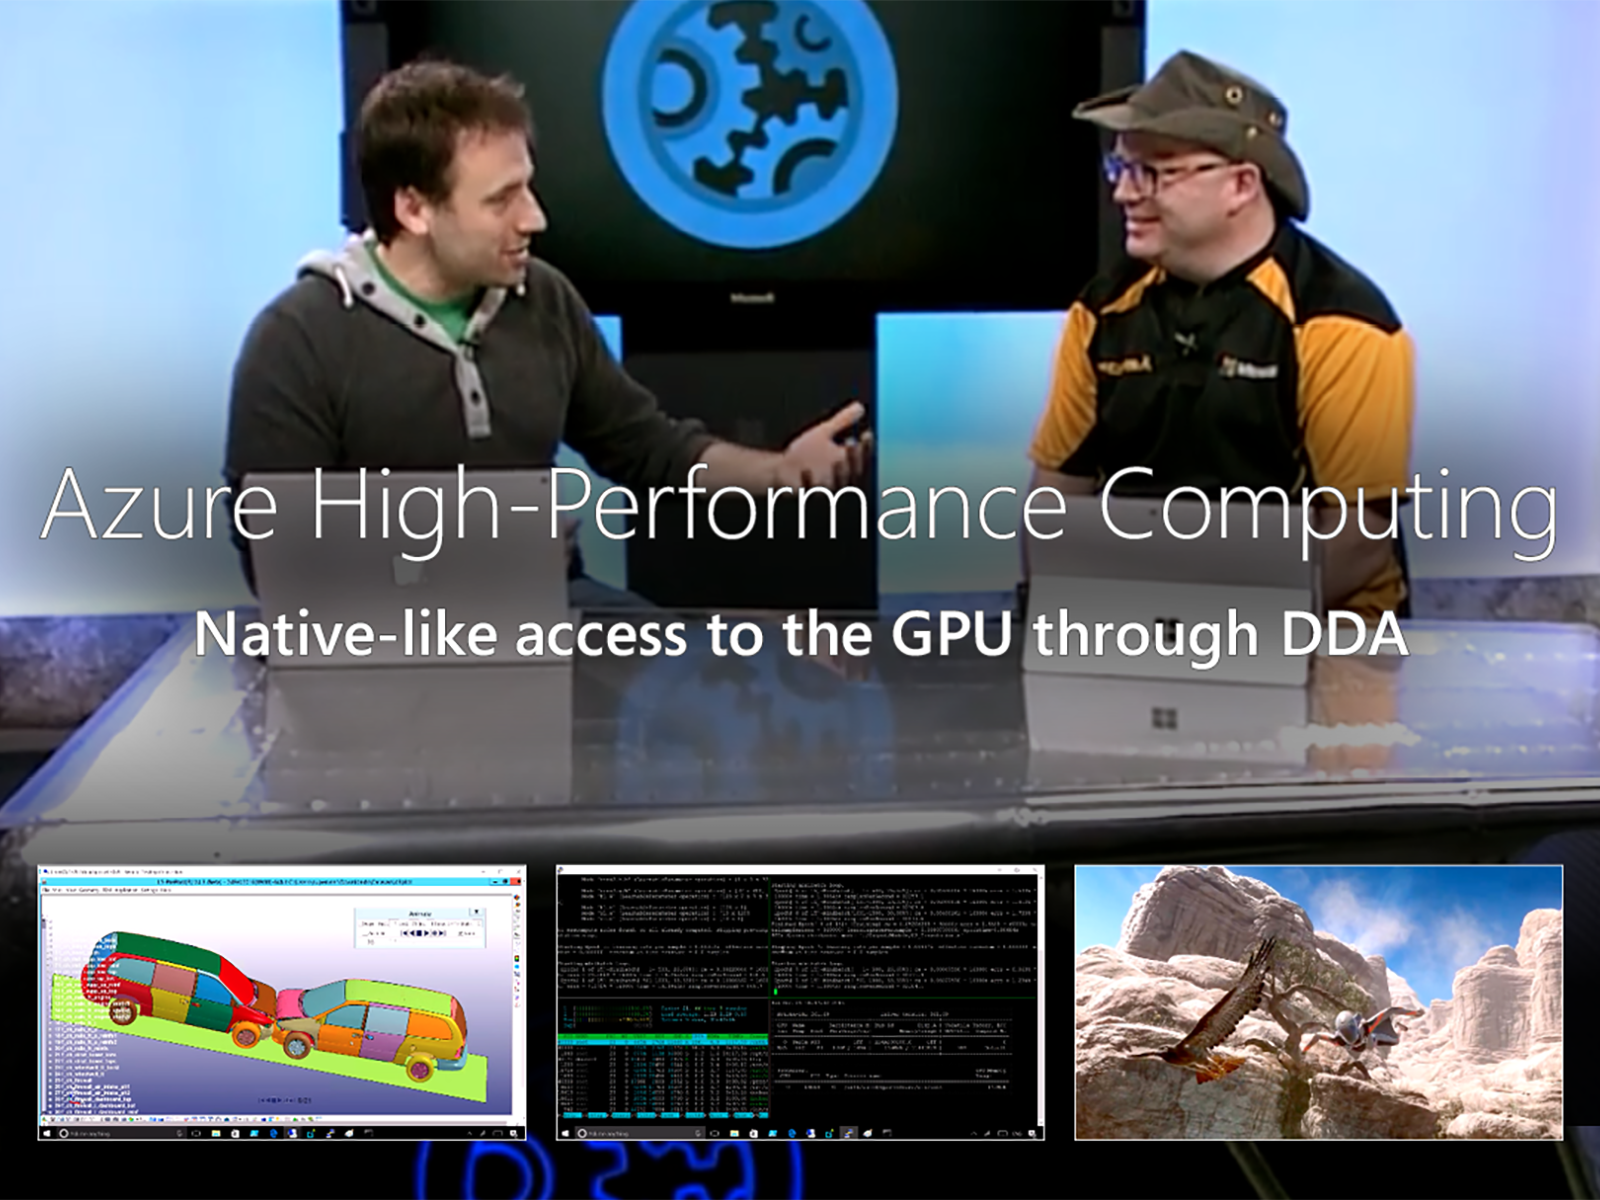 Artwork for Azure High-Performance Computing